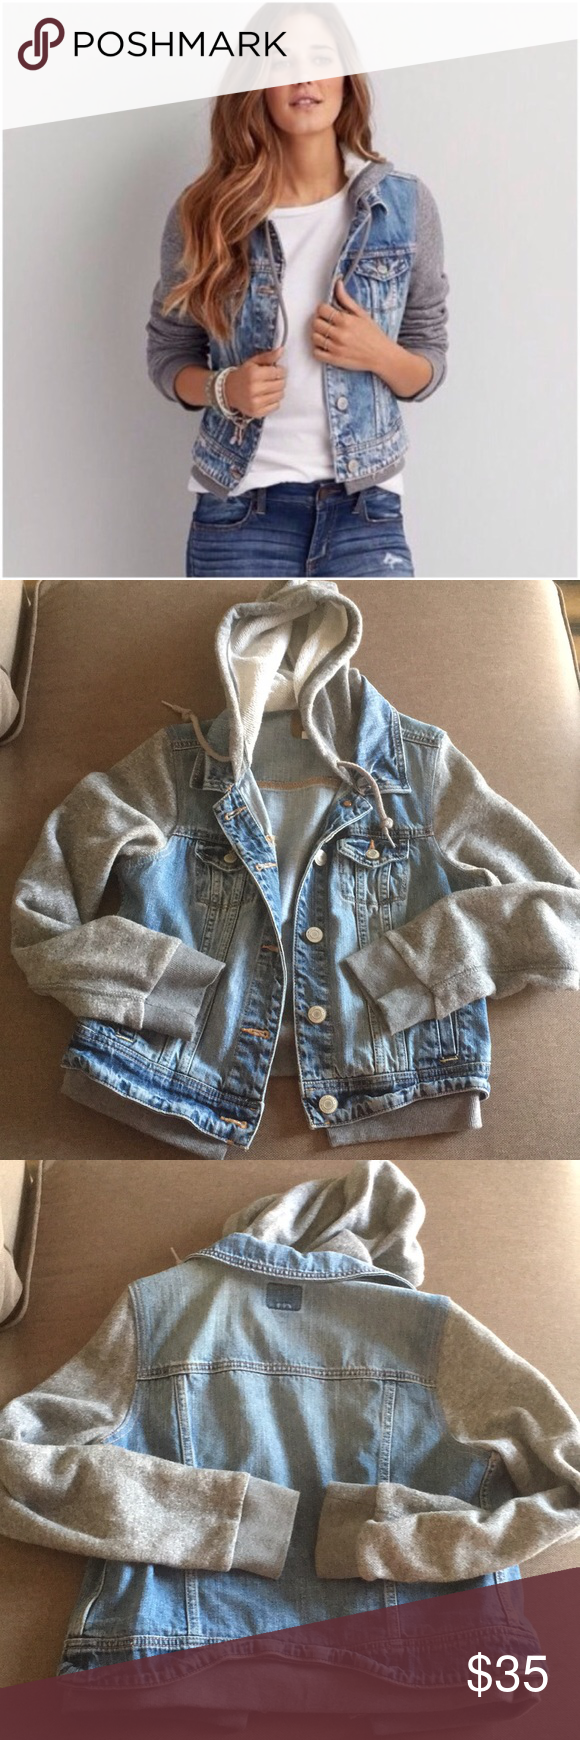 Aeo Jean Jacket Sweatshirt Combo Clothes Design Fashion Cute Jean Jackets [ 1740 x 580 Pixel ]